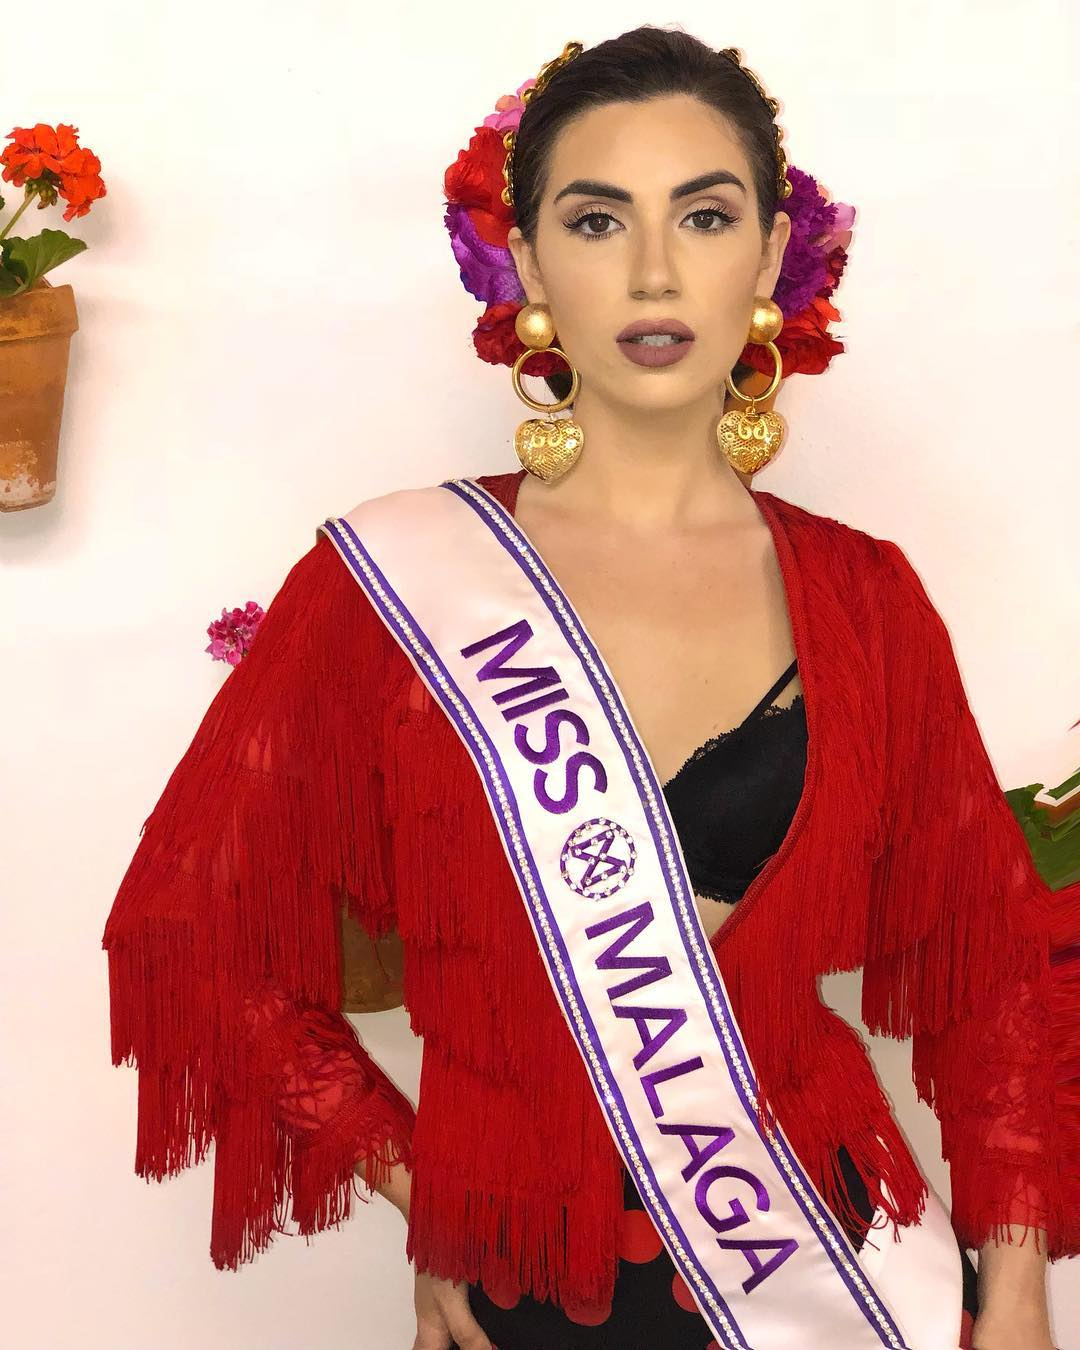 ainhoa portillo, miss world malaga 2018. 38202611